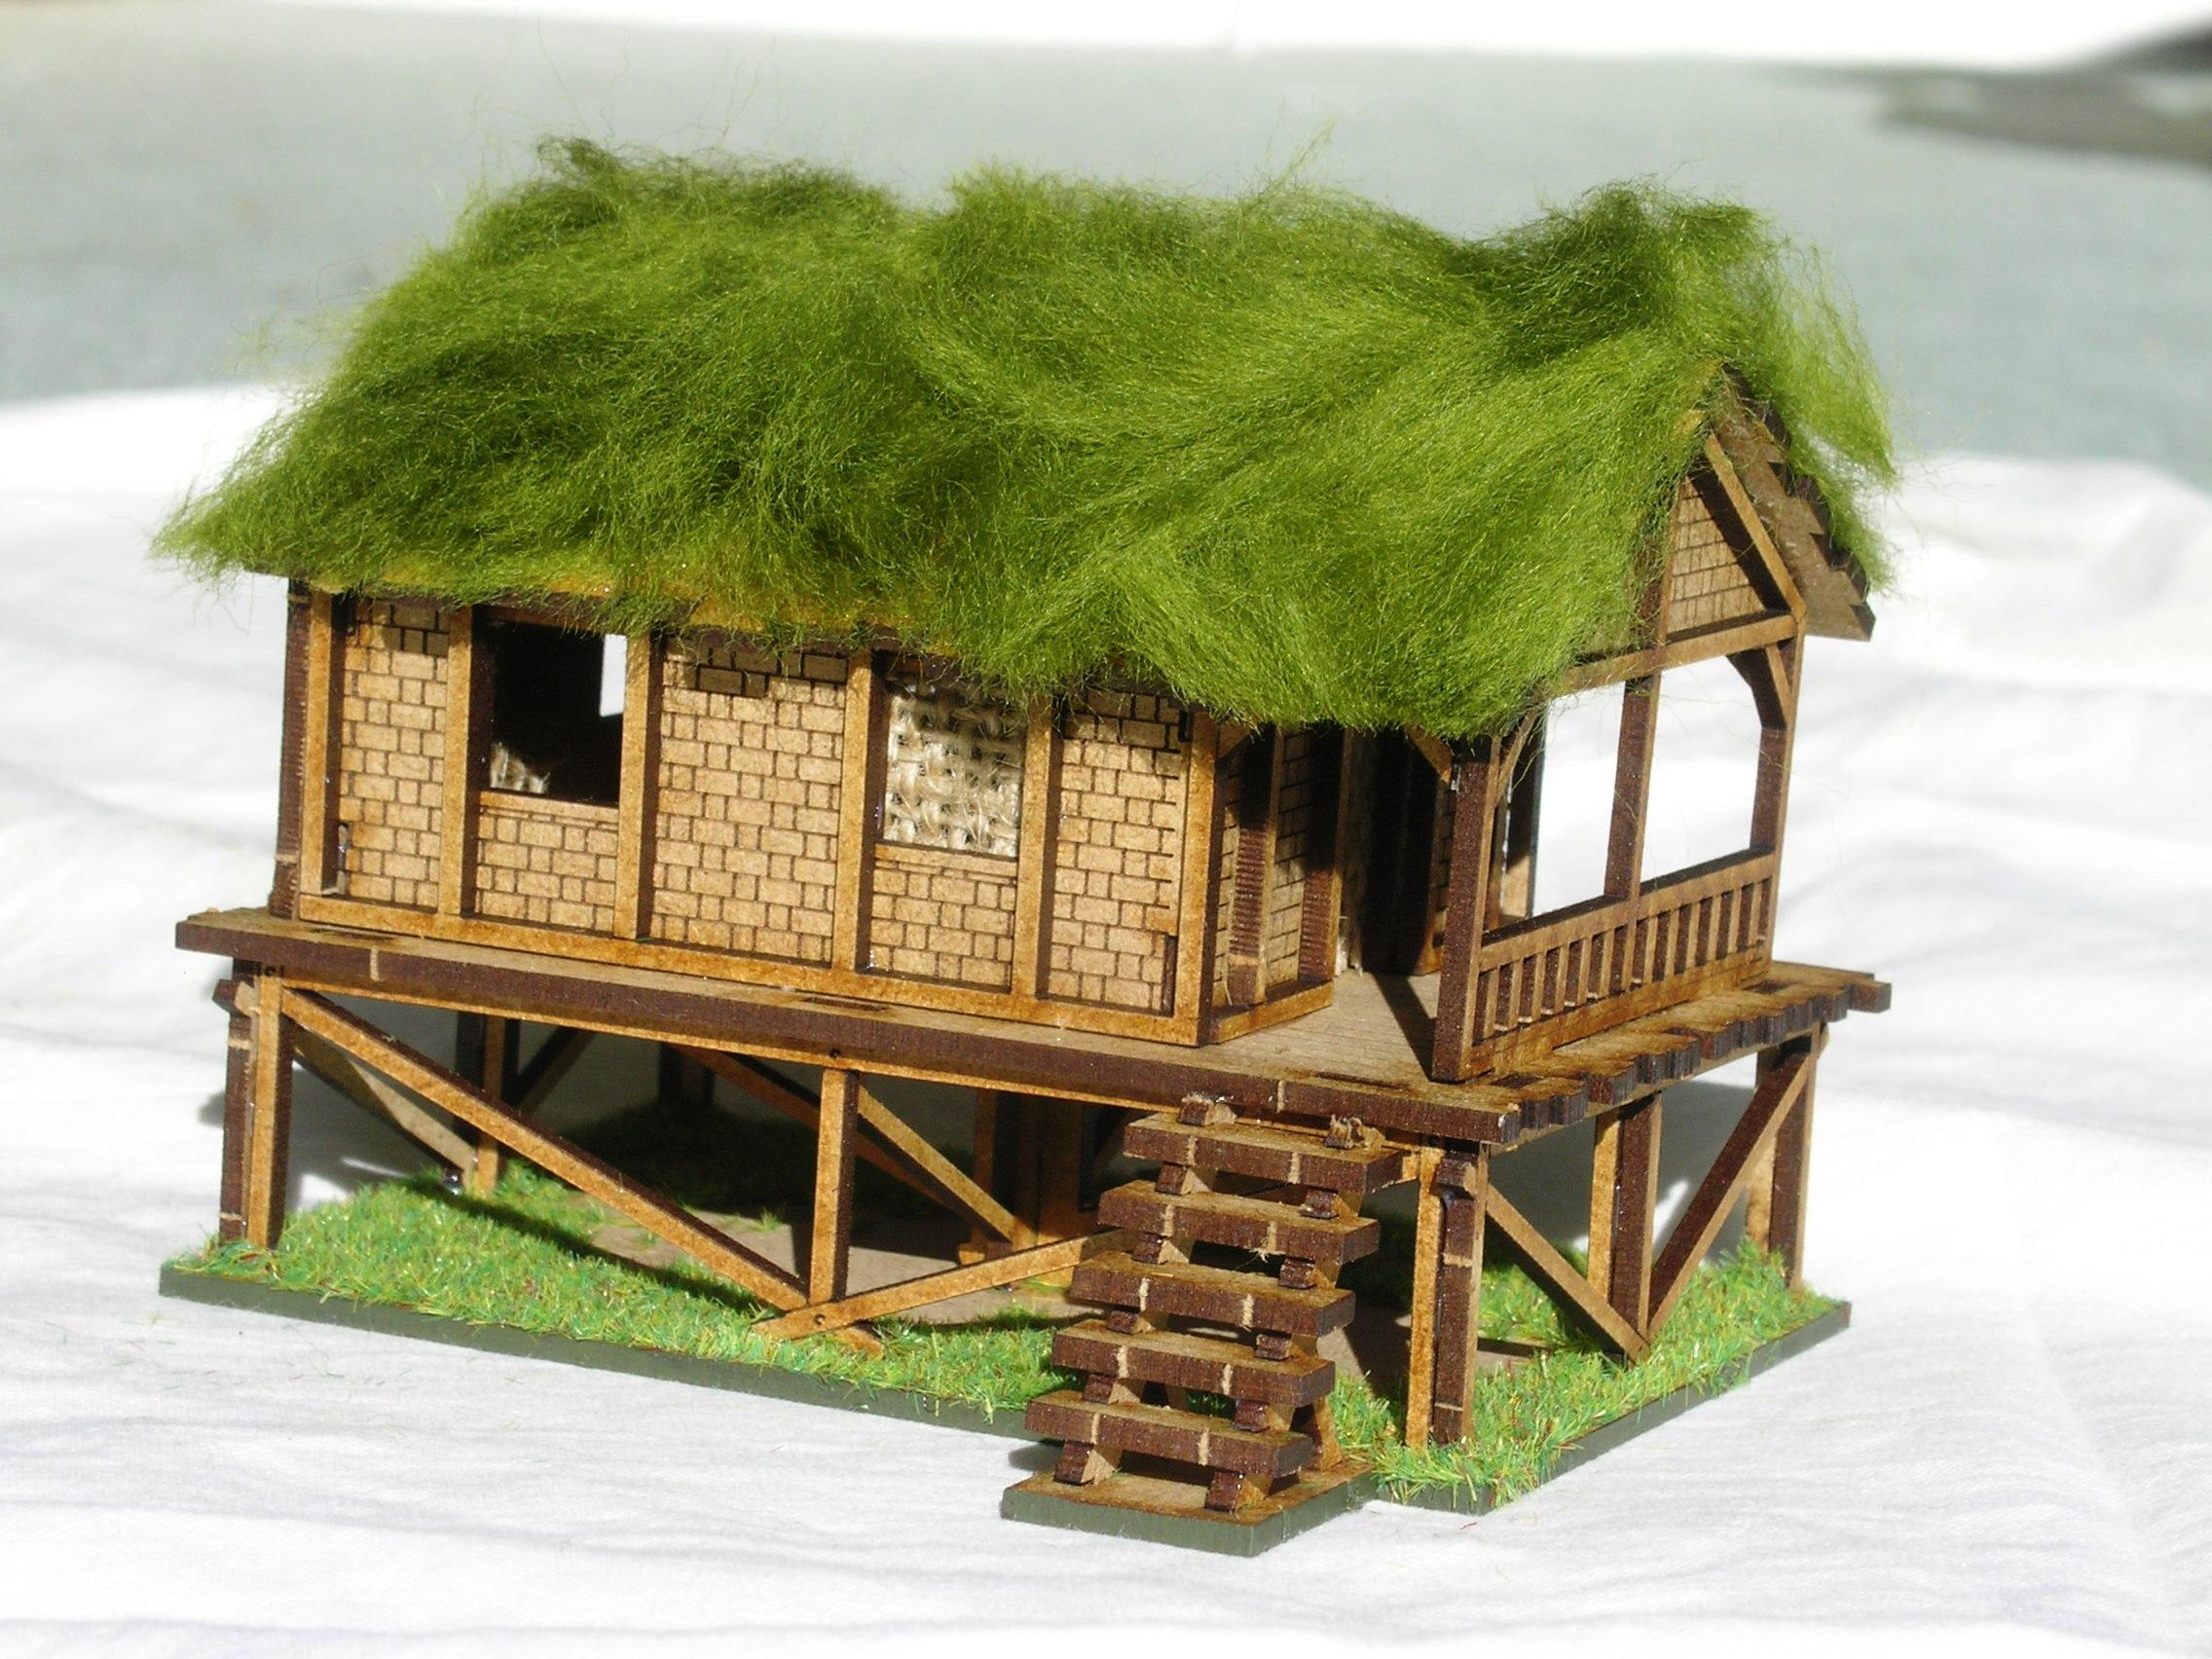 Building Four: Woven Palm Style Village House